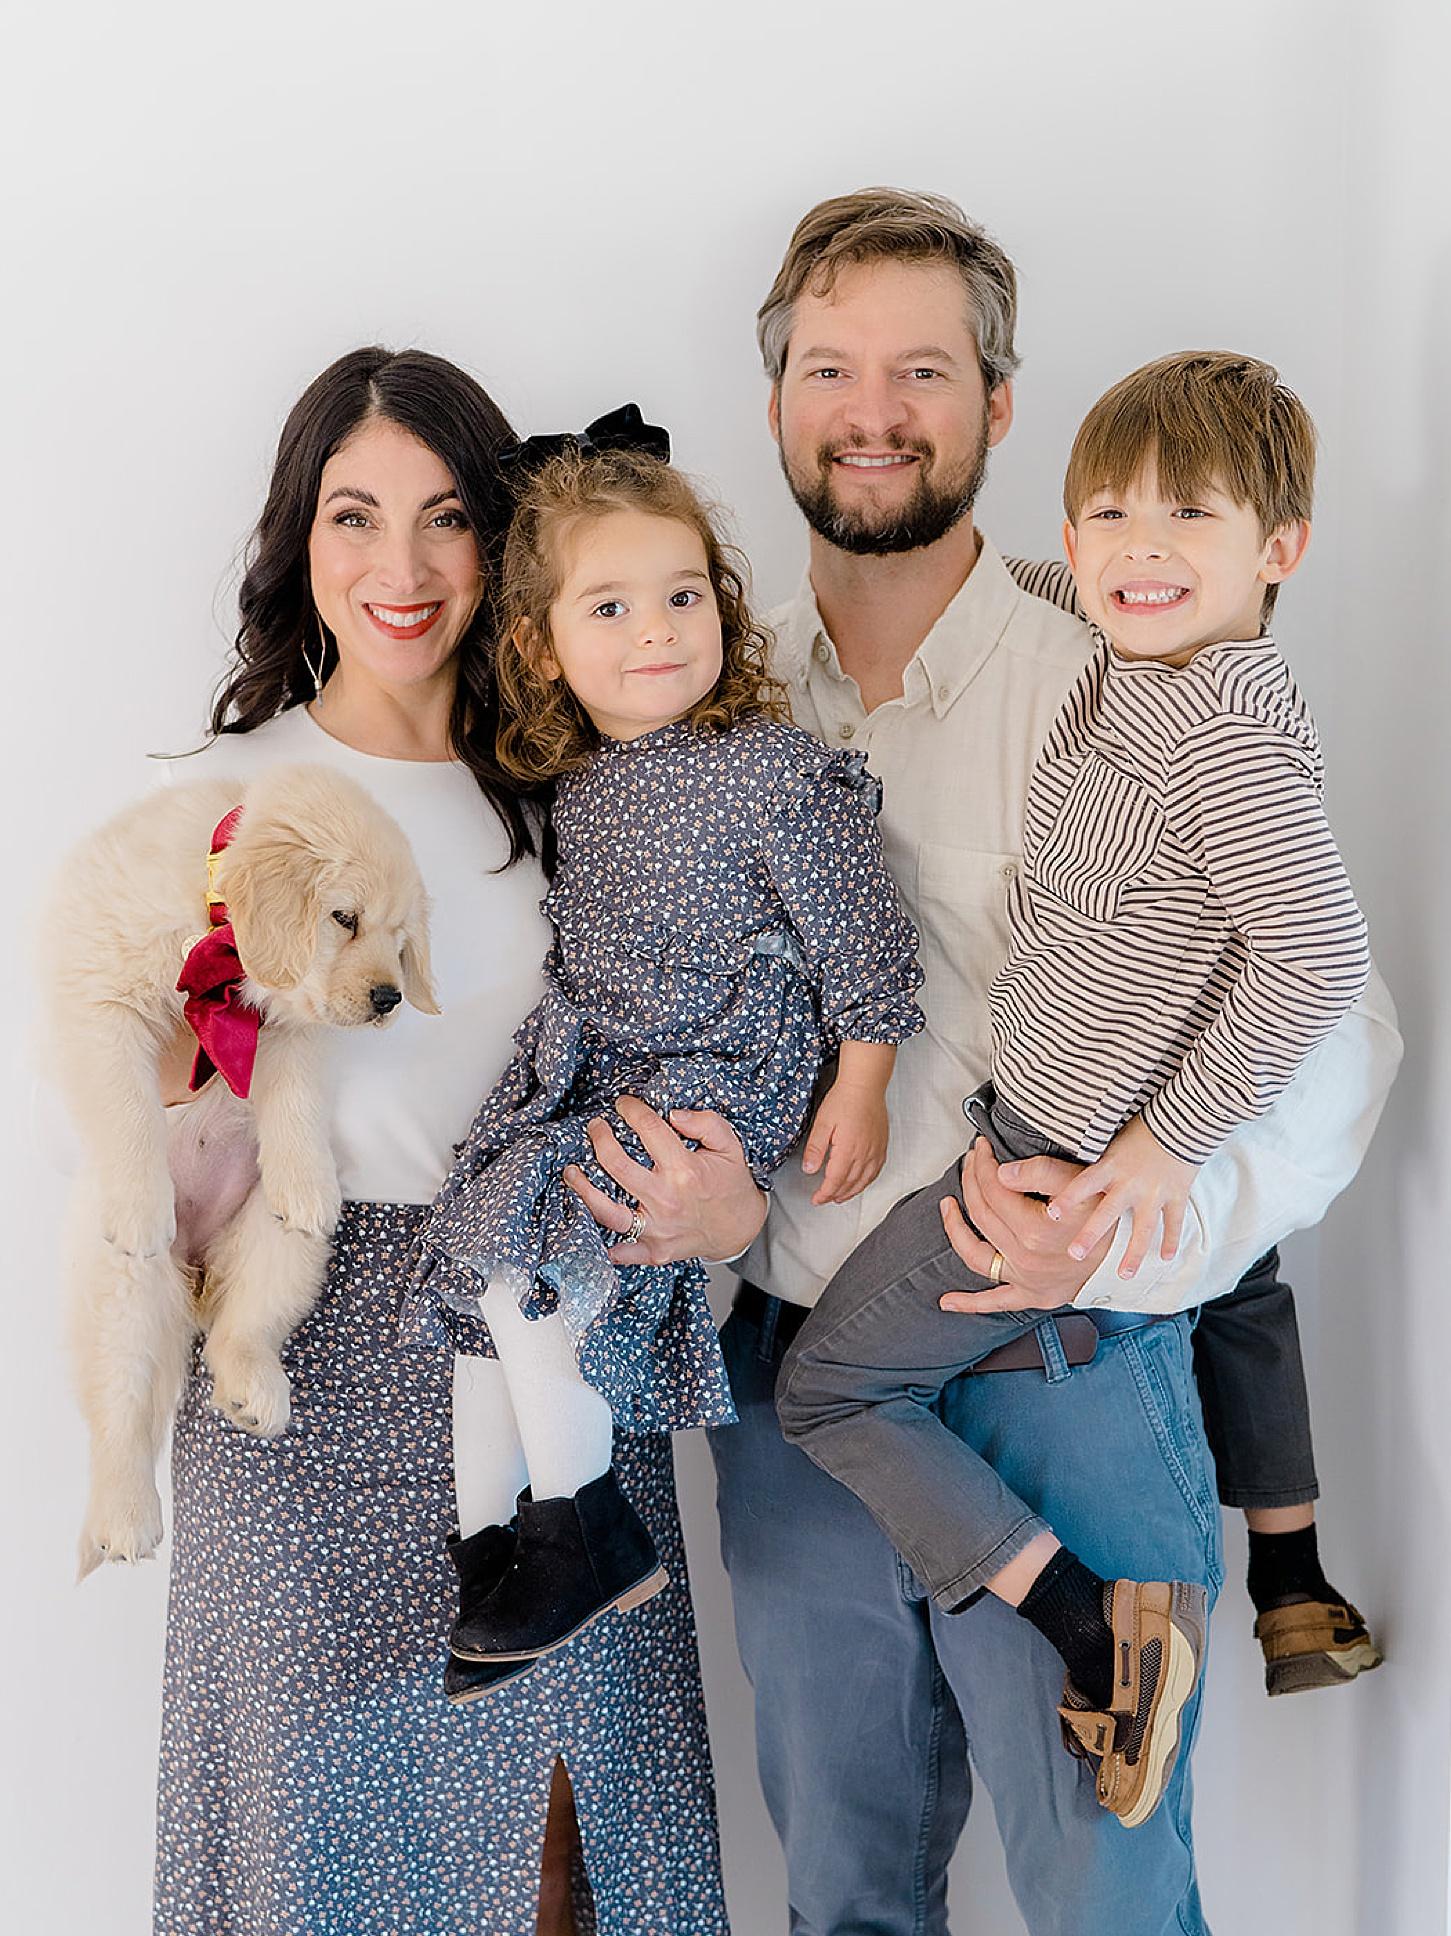 Ocean City NJ Family Portrait Photography by Magdalena Studios 0015